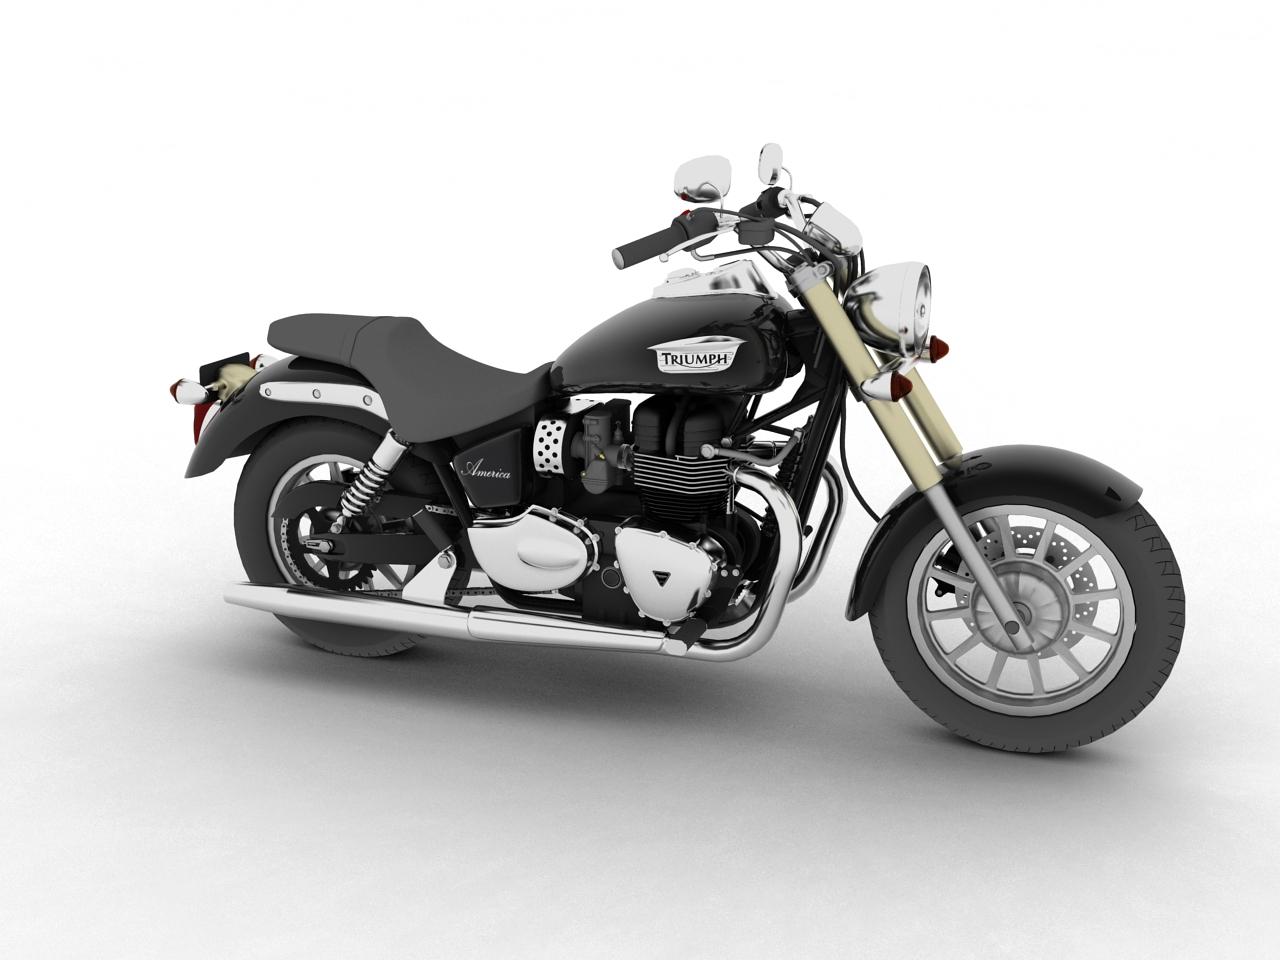 triumph america 2012 3d model 3ds max fbx c4d obj 154902